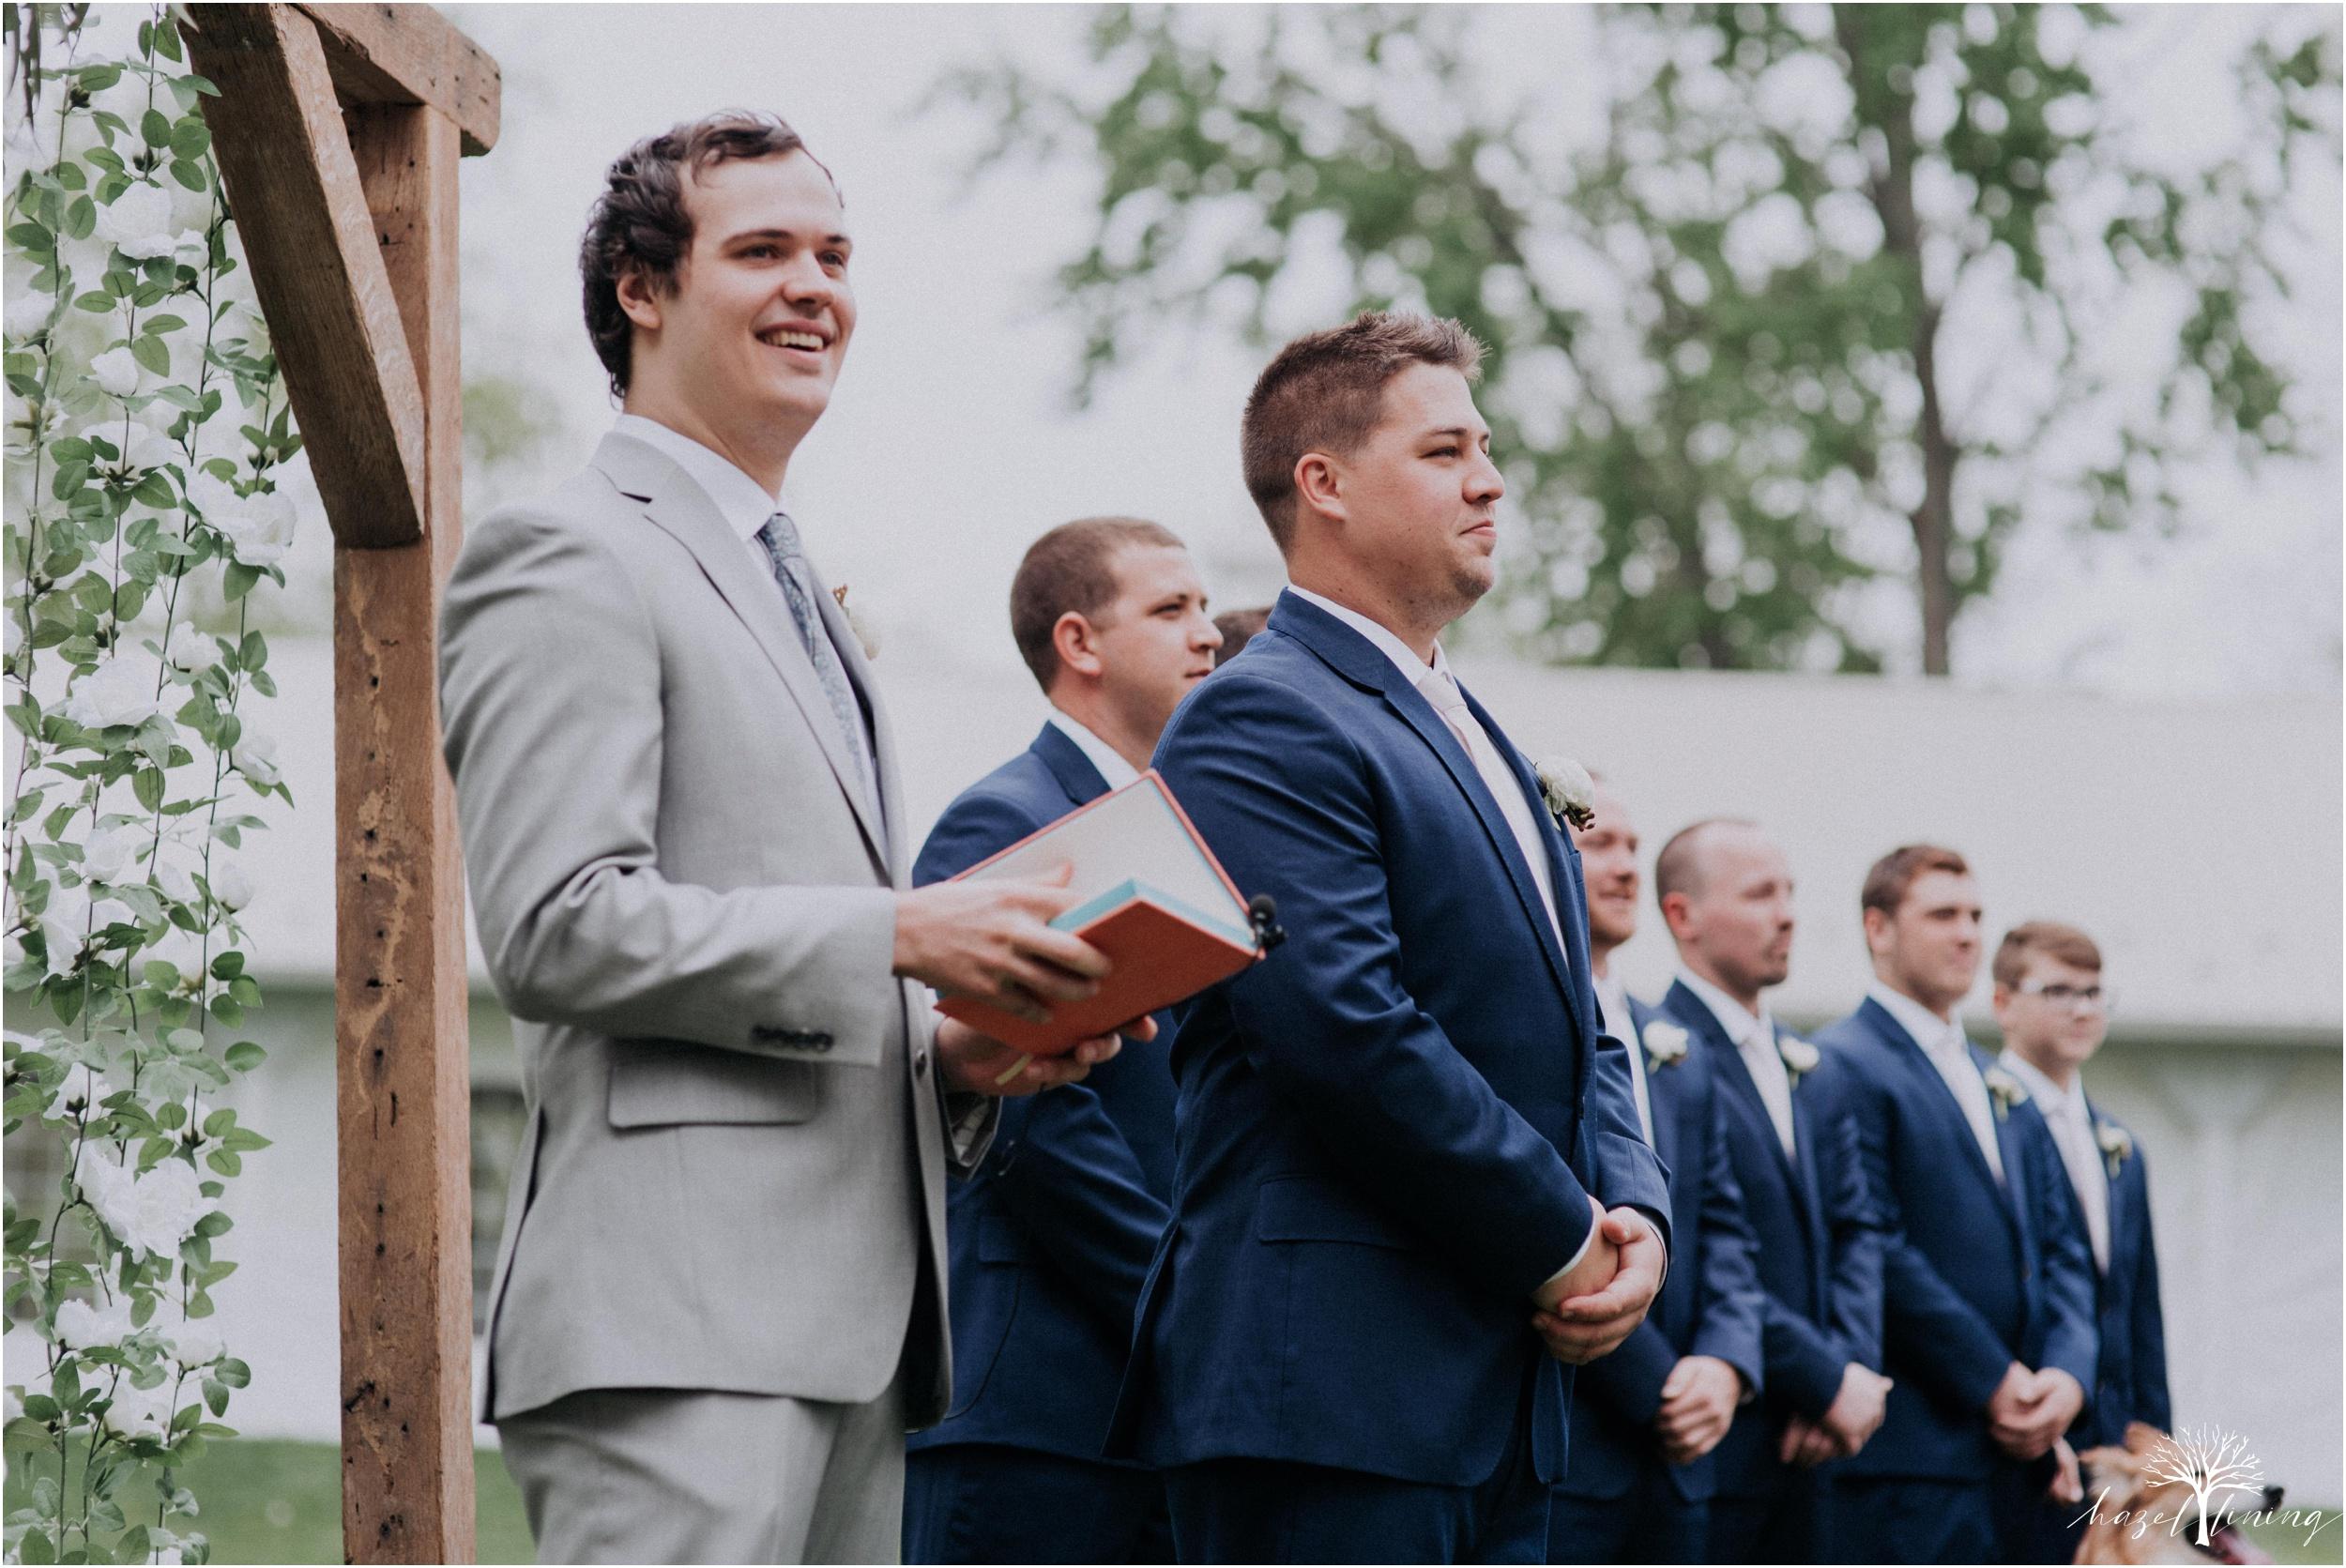 hazel-lining-travel-wedding-elopement-photography-abby-skyler-hunt-the-willis-house-york-pennsylvania-outdoor-estate-wedding_0077.jpg